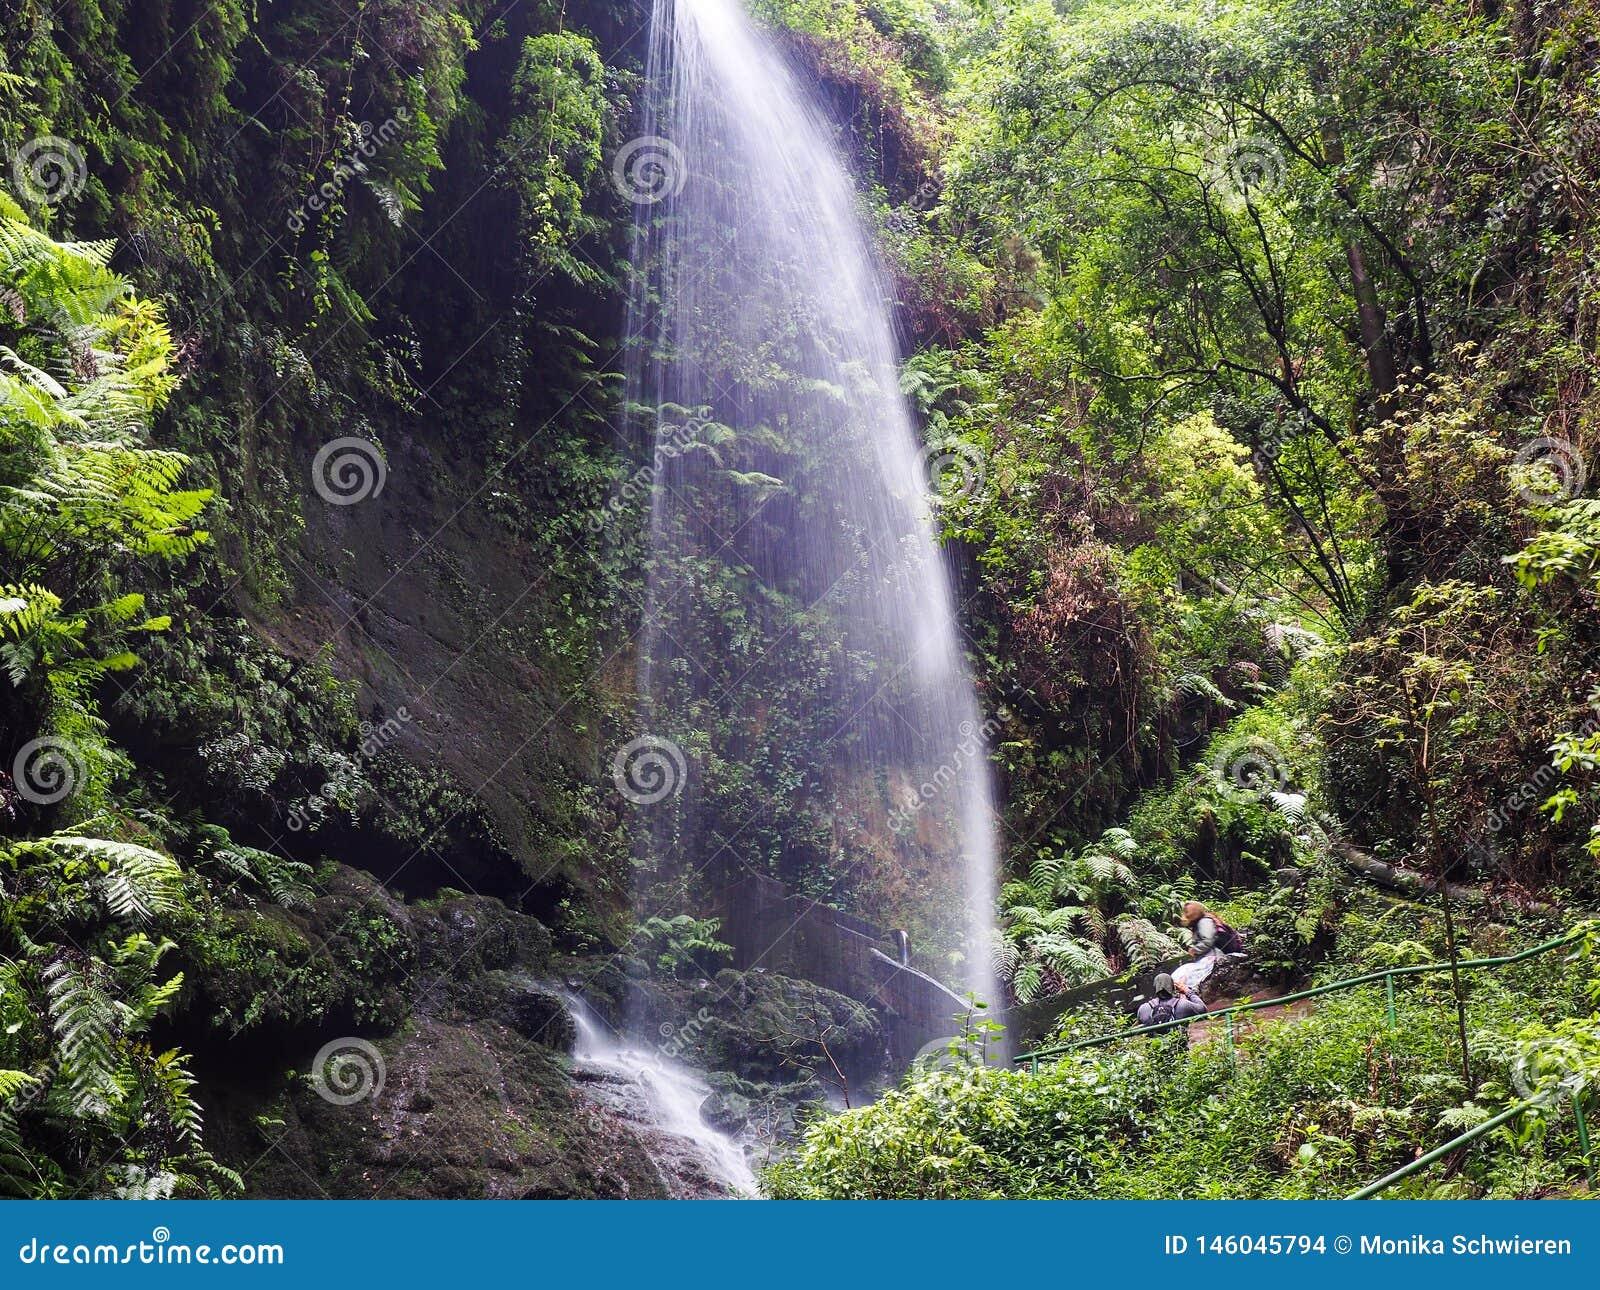 Водопад в середине канарских джунглей на Ла Palma, Канарских островах